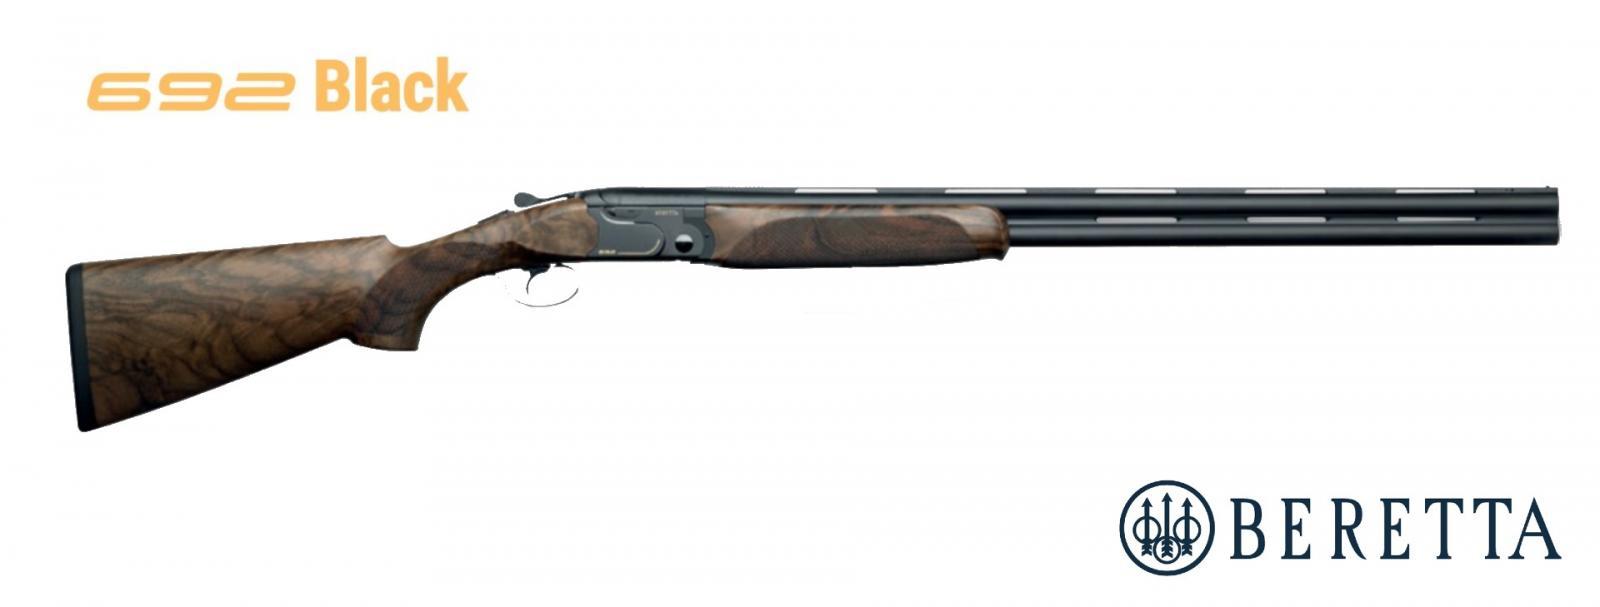 Fusil superposé BERETTA 692 TRAP Black Édition Canon 76